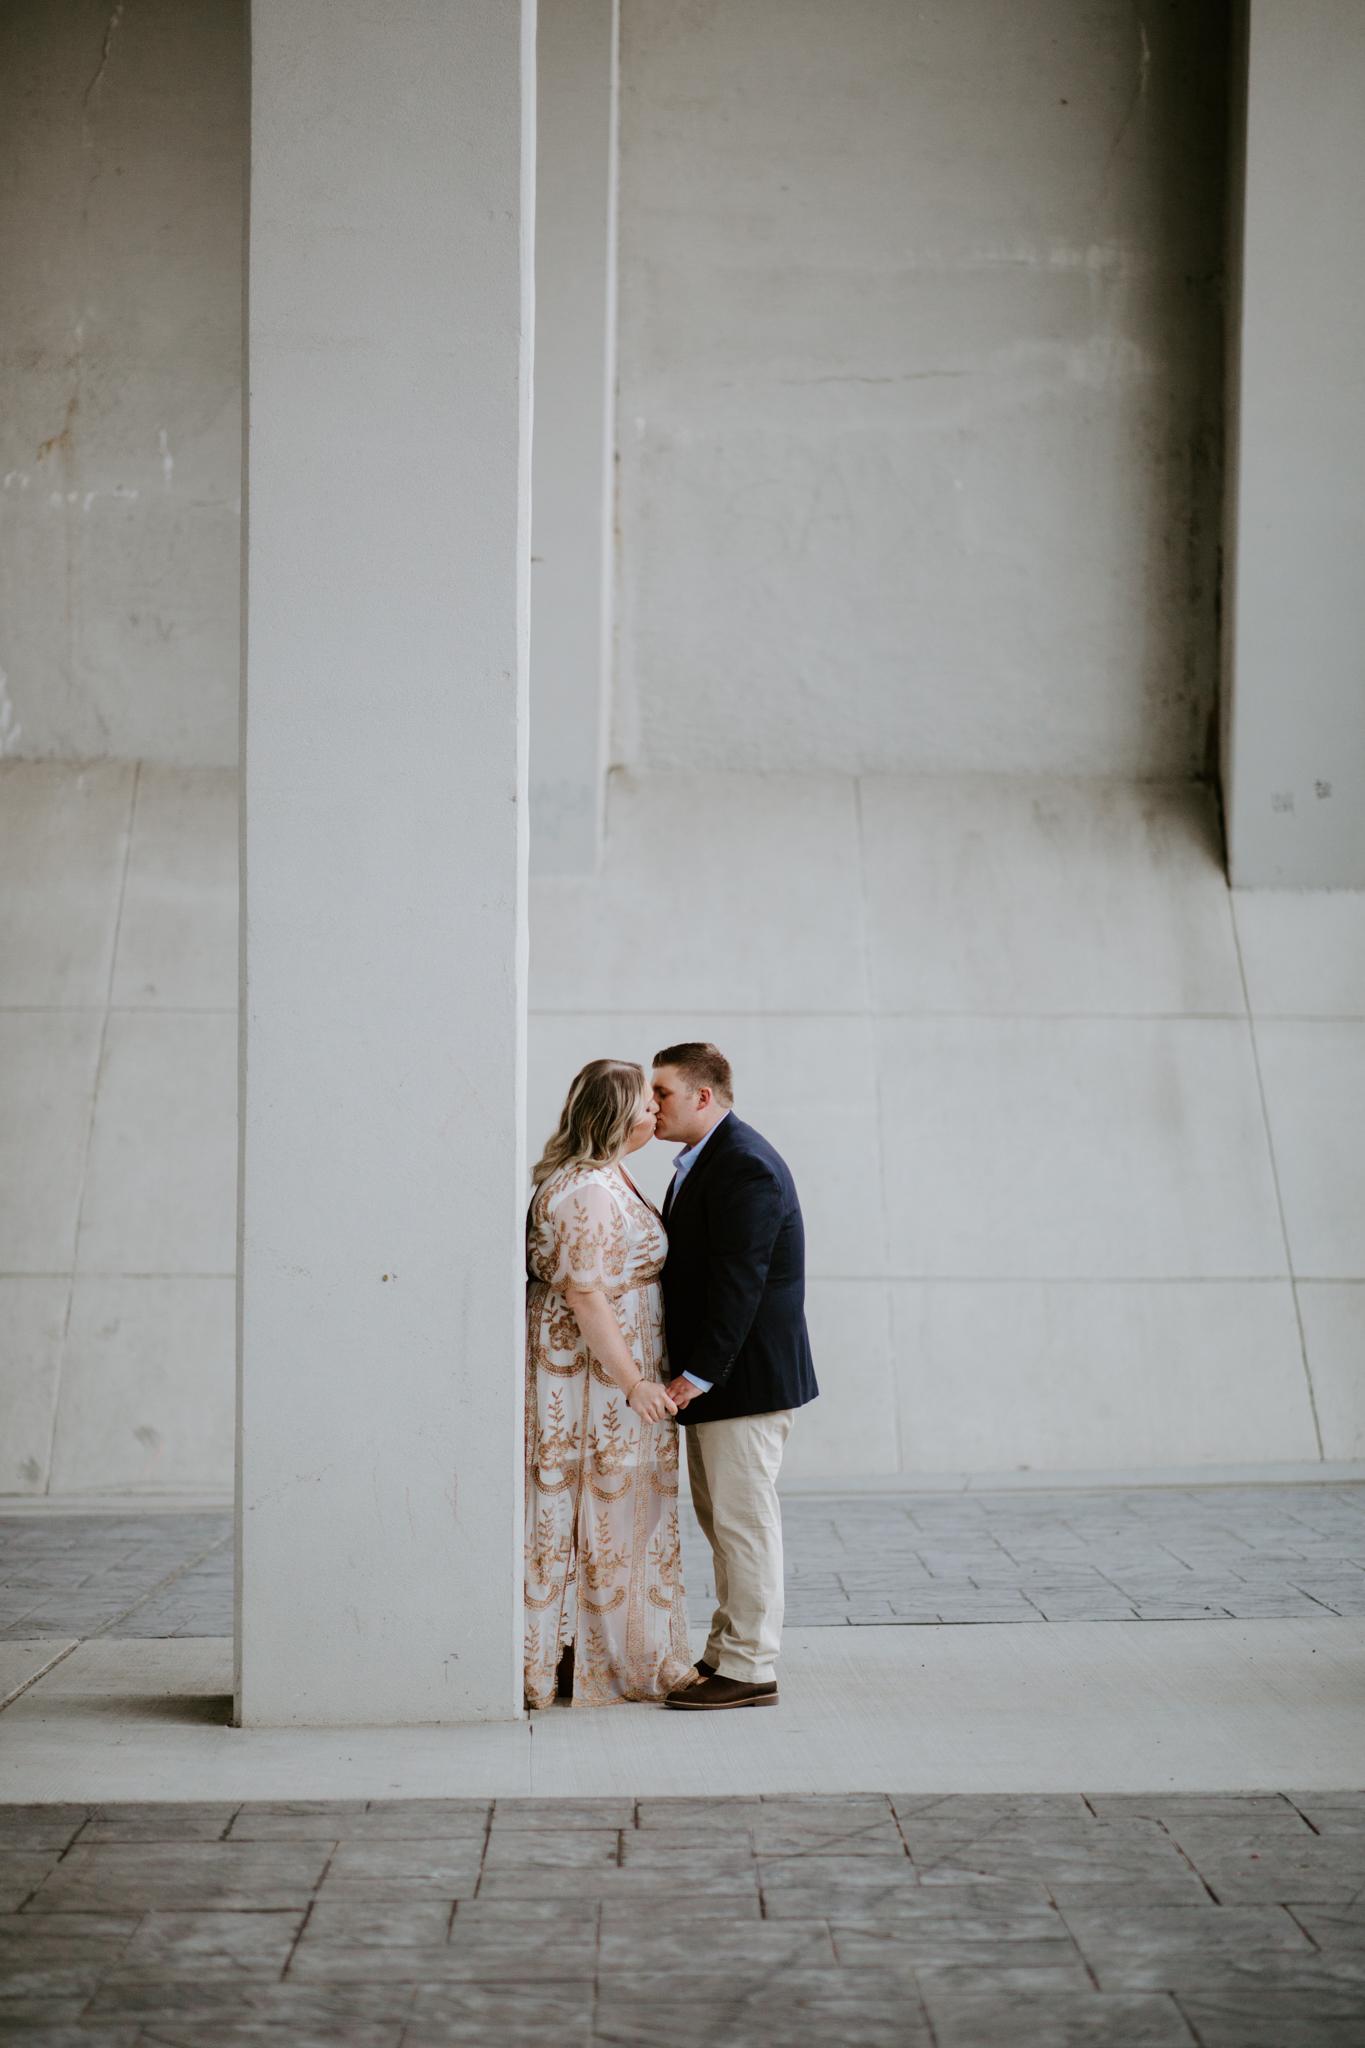 Ryley + Dalton + Chattanooga + Nashville + Knoxville+ Wedding + Engagement + Photographer-29.jpg